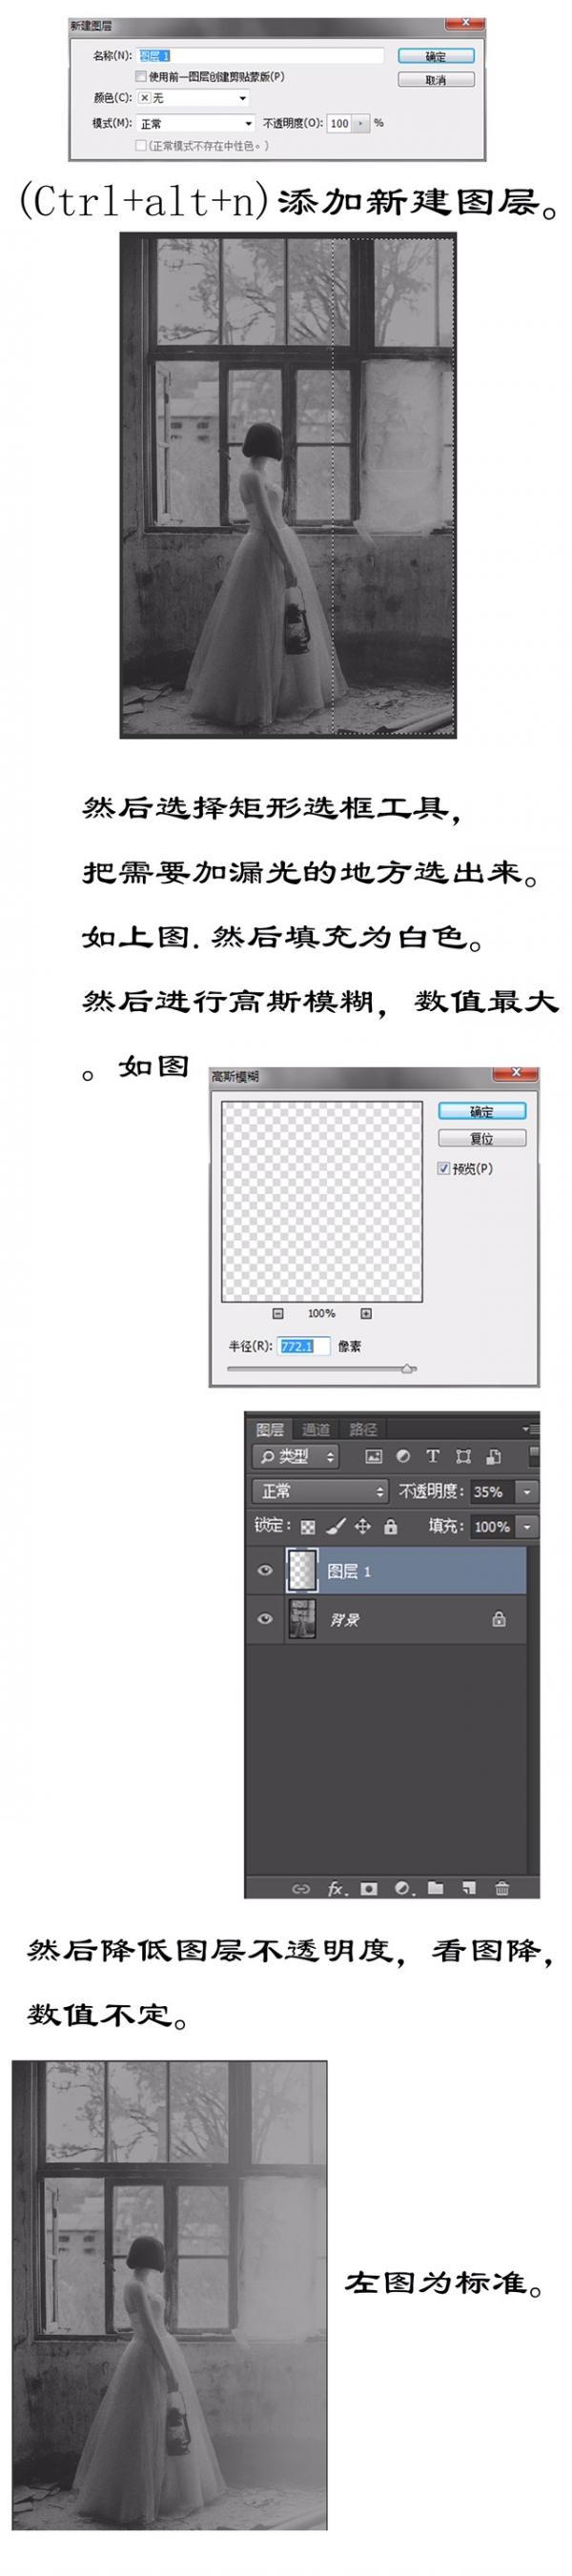 photoshop后期打造暗系调调色教程